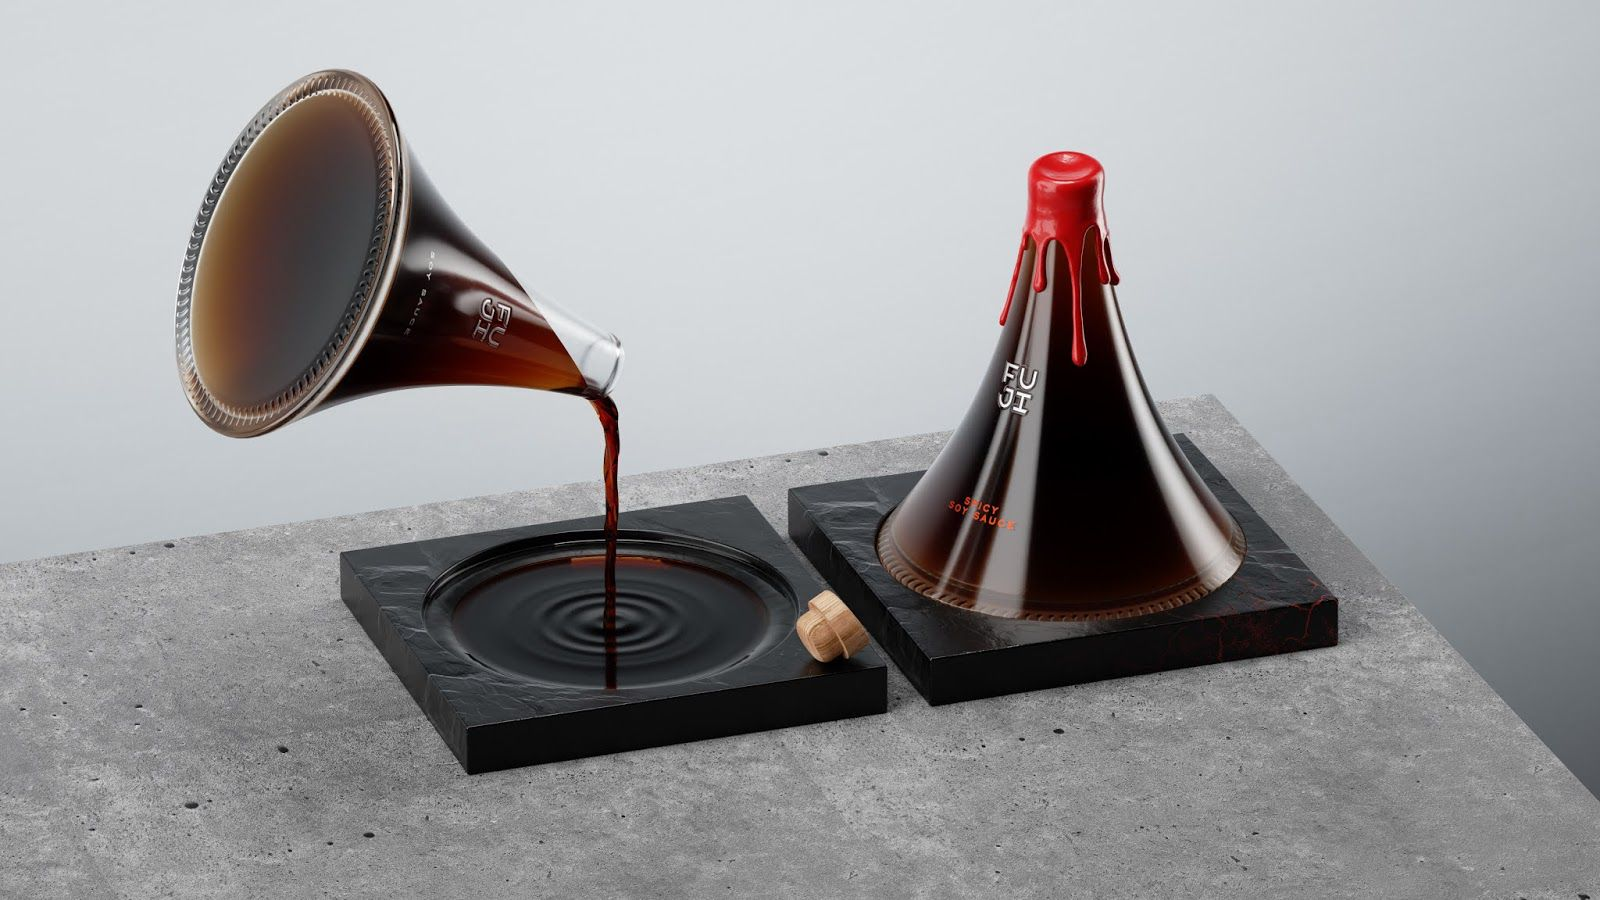 FUJI (sauce soja premium originaire du volcan japonais FUJI) I Design (projet étudiant : Evgeni Kudrinskaya (HSE Art and Design Schoool), Russie (mars 2021)